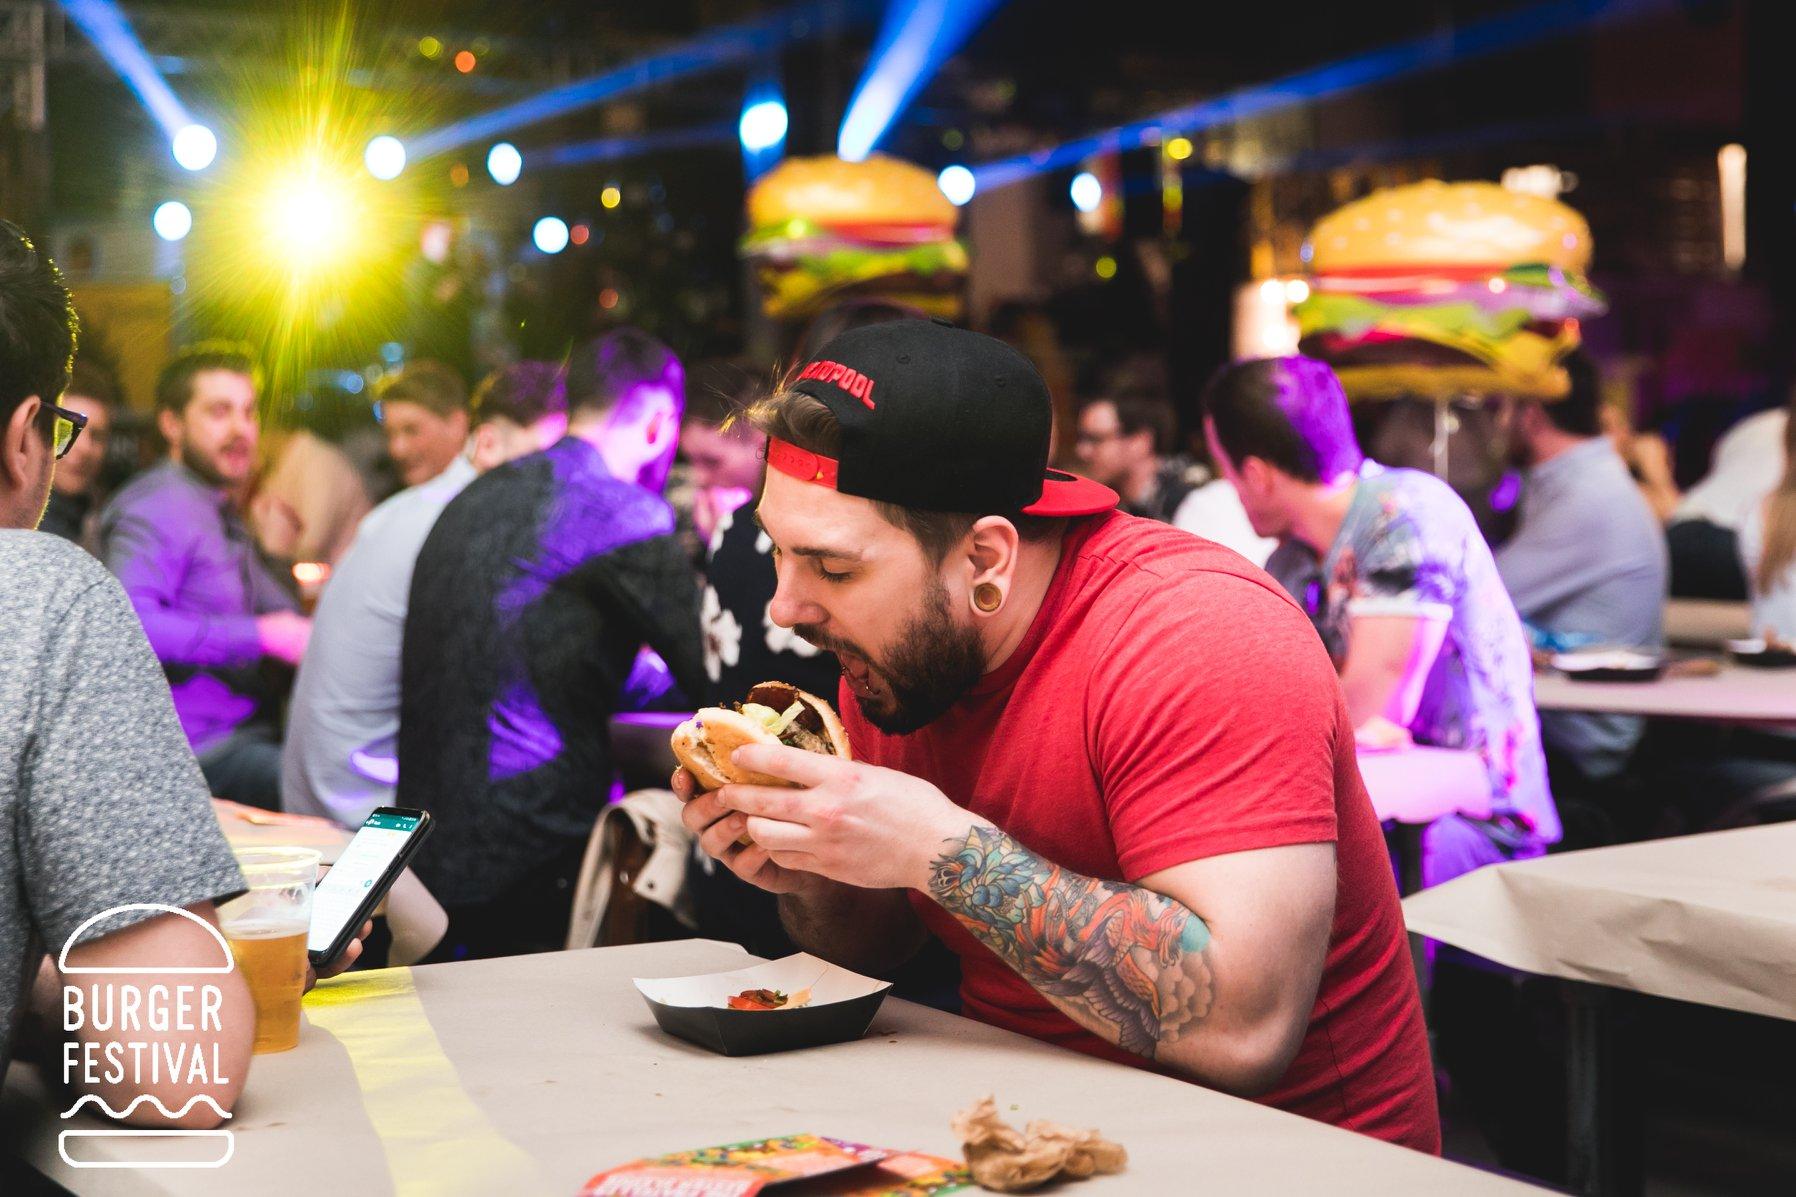 The Burger Festival